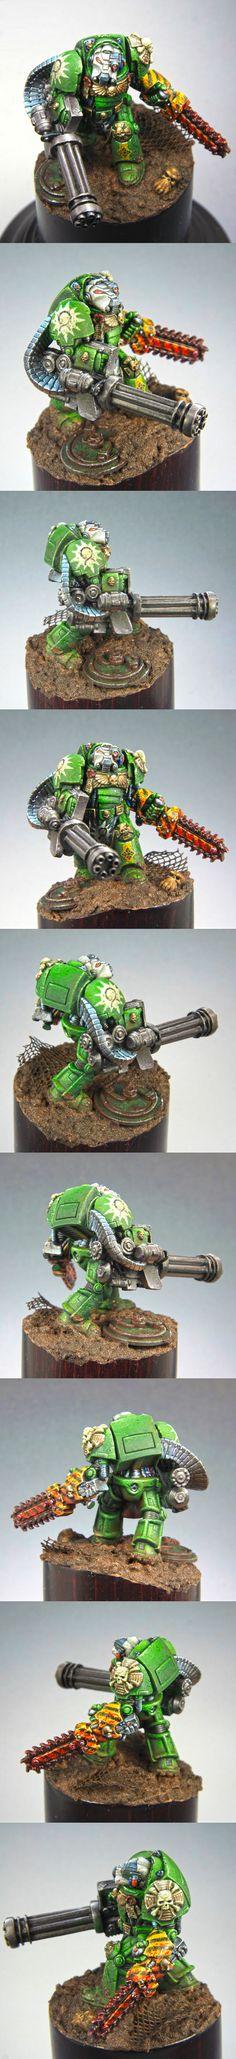 Aurora space marine terminator & assault cannon